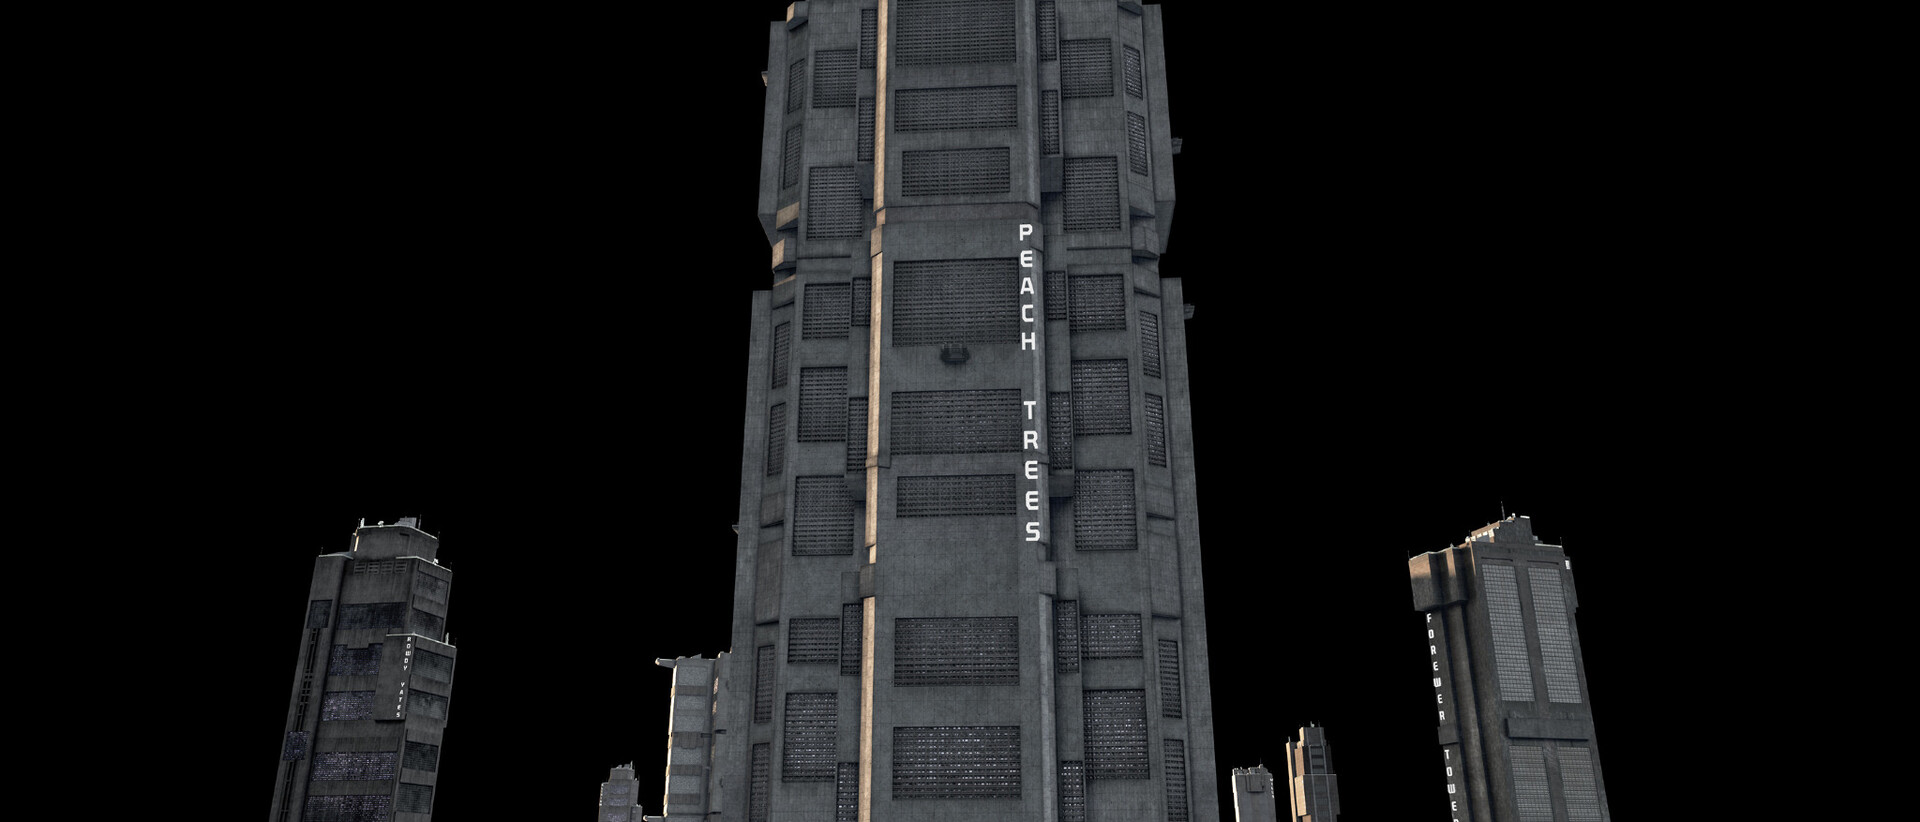 basic 3d render of Peach Trees and surrounding mega blocks